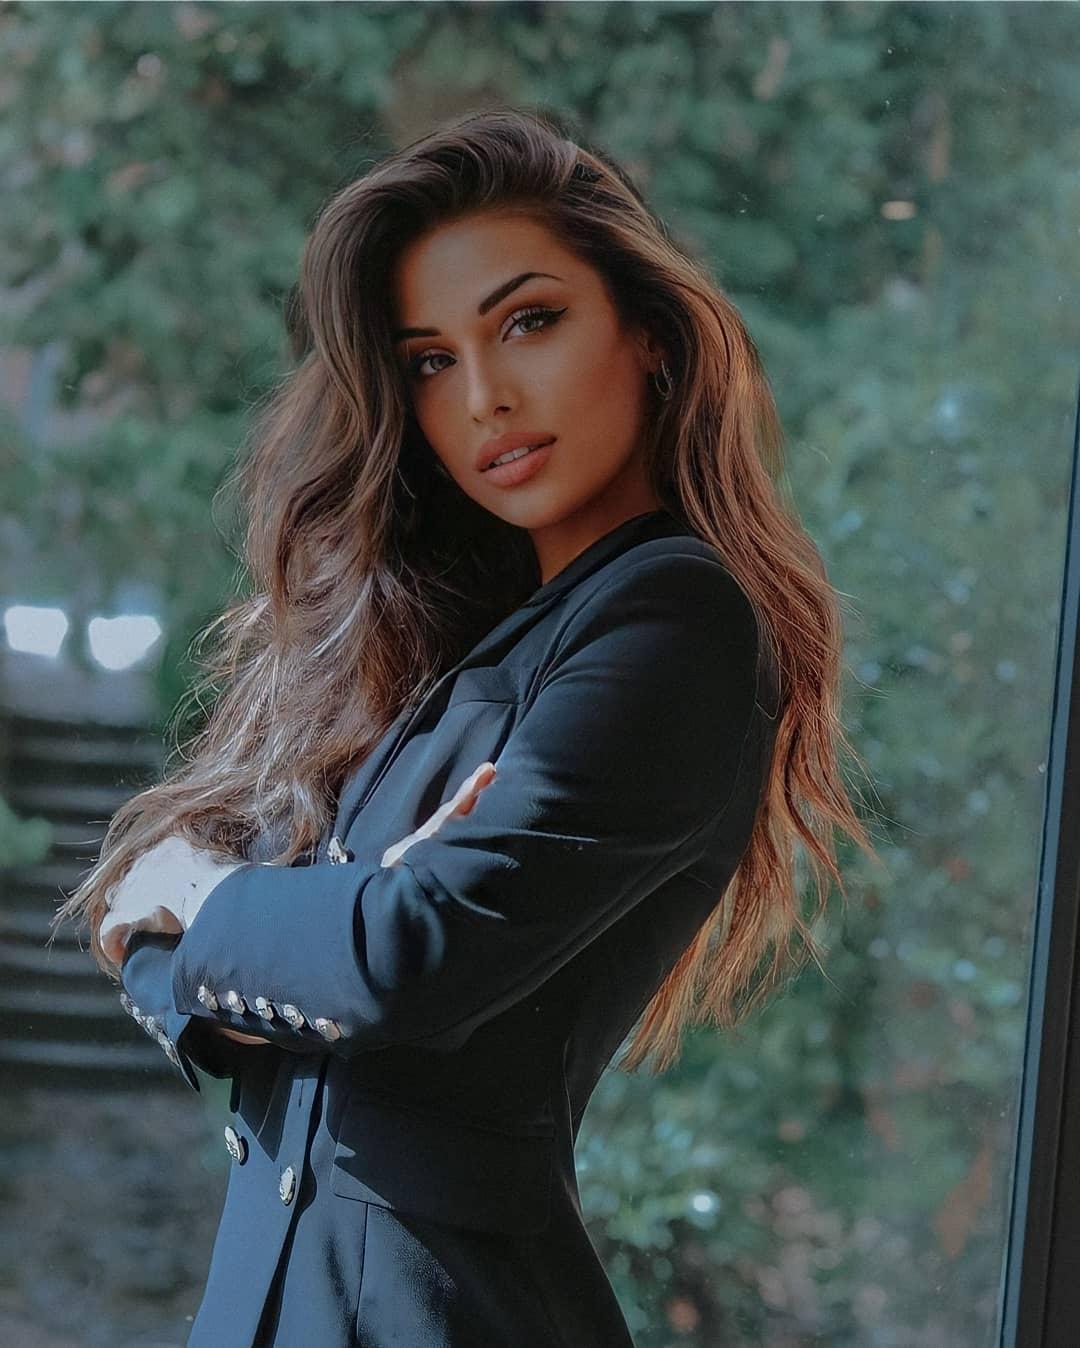 Alessia-Spagnulo-Wallpapers-Insta-Fit-Bio-1